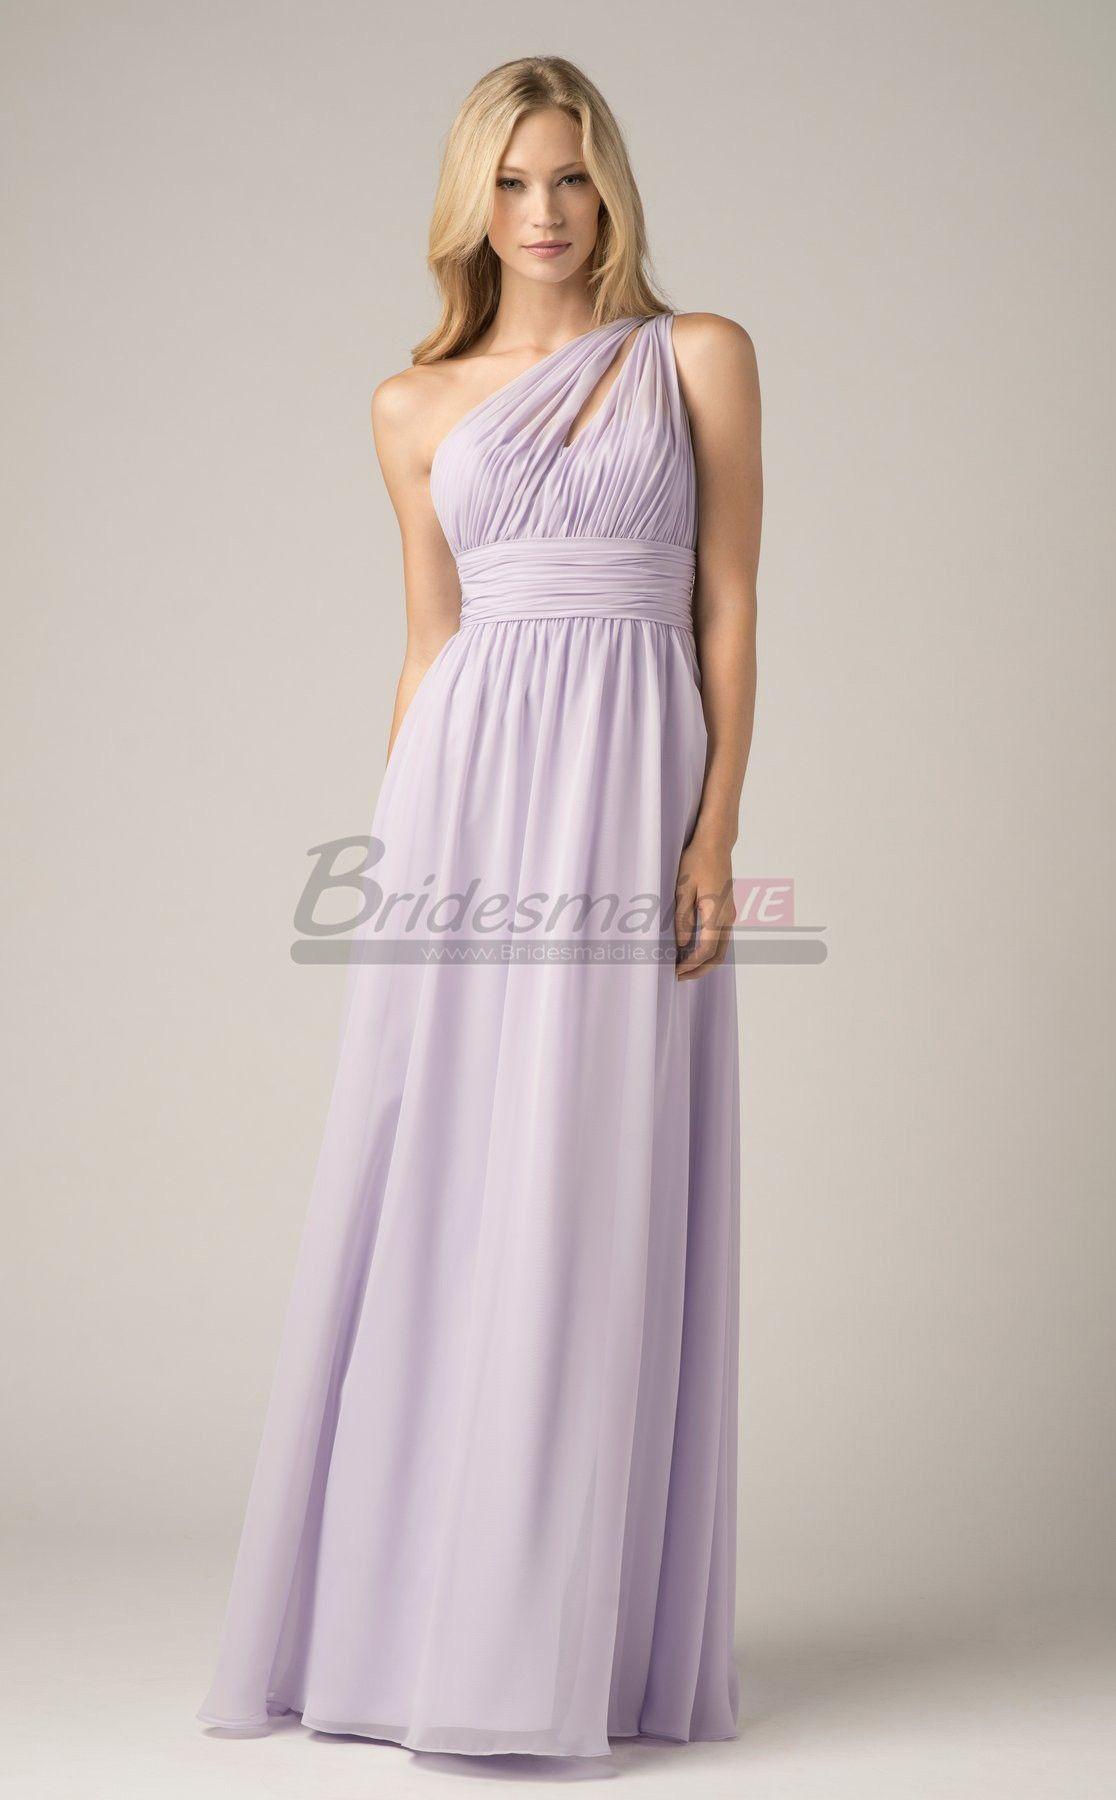 Lilac long lace empire waist one shoulder bridesmaid dress bdie